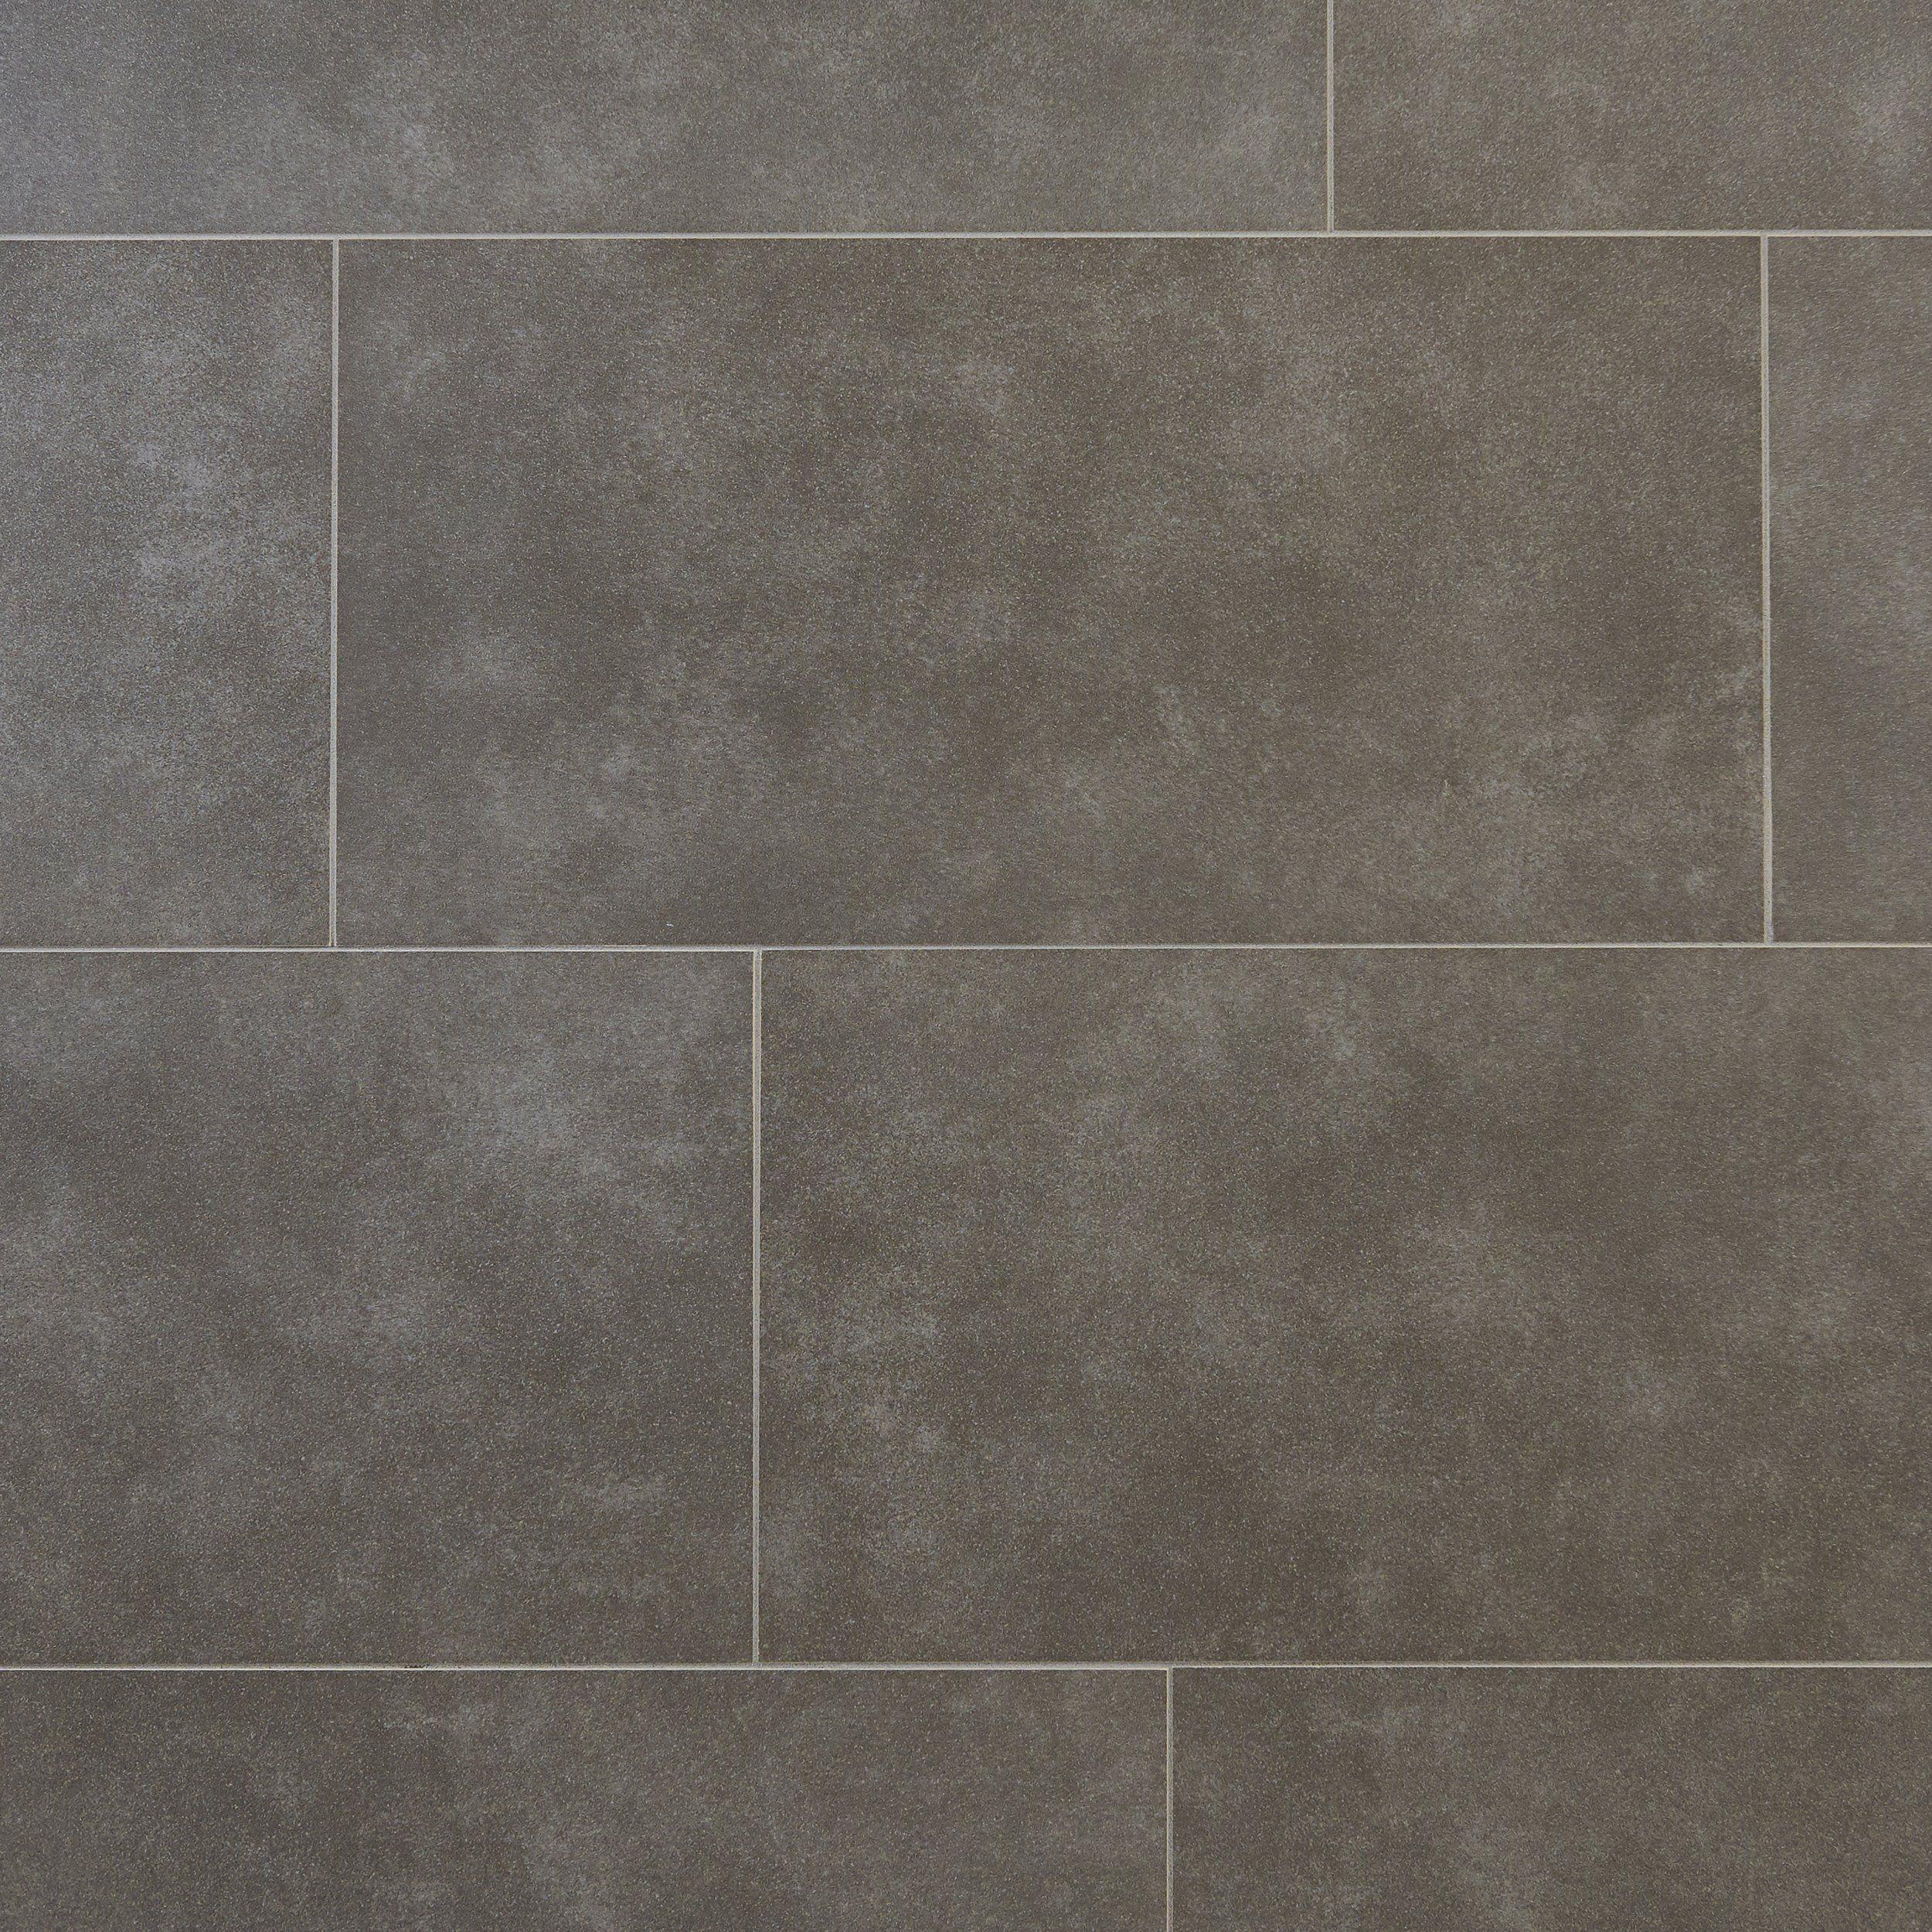 Concrete Gray Ceramic Tile Floor Decor In 2020 Tile Layout Flooring Porcelain Tile